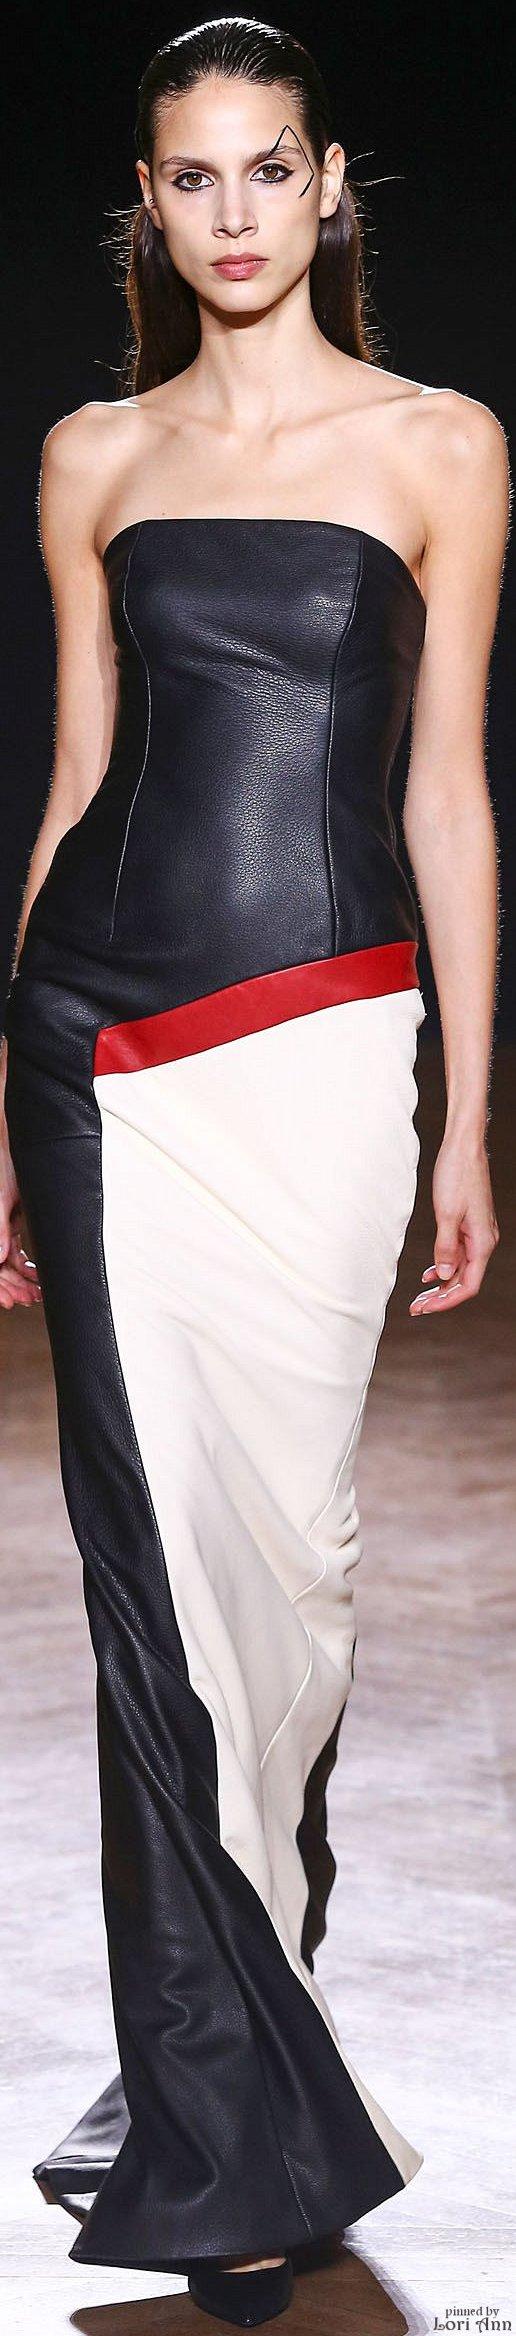 Didit Hediprasetyo Couture Fall 2015 +